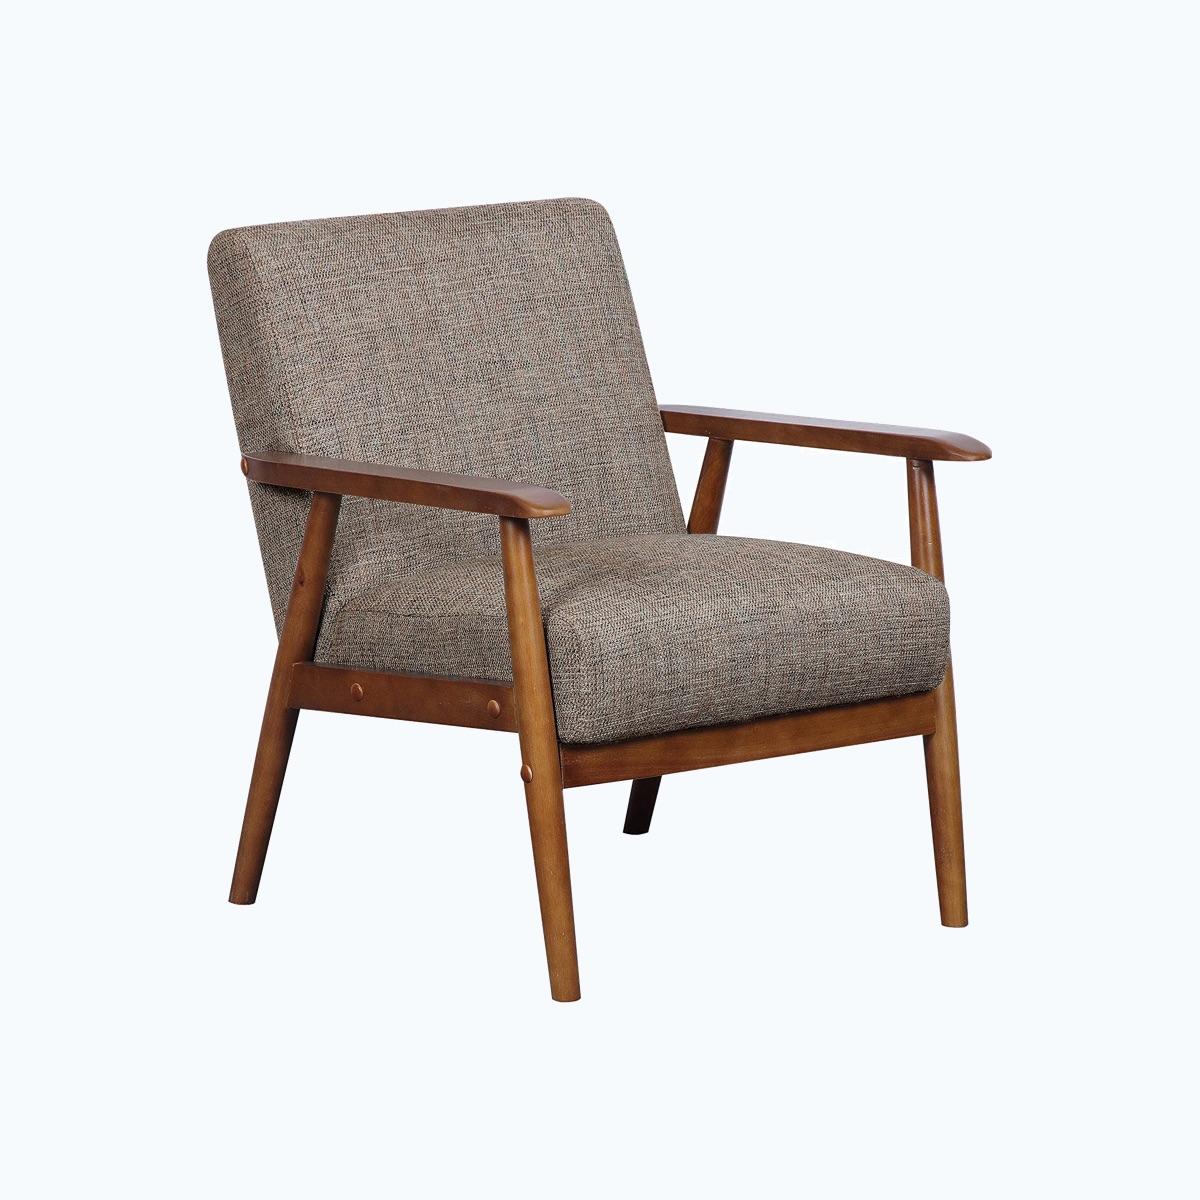 Wood Frame Chair by Pulaski